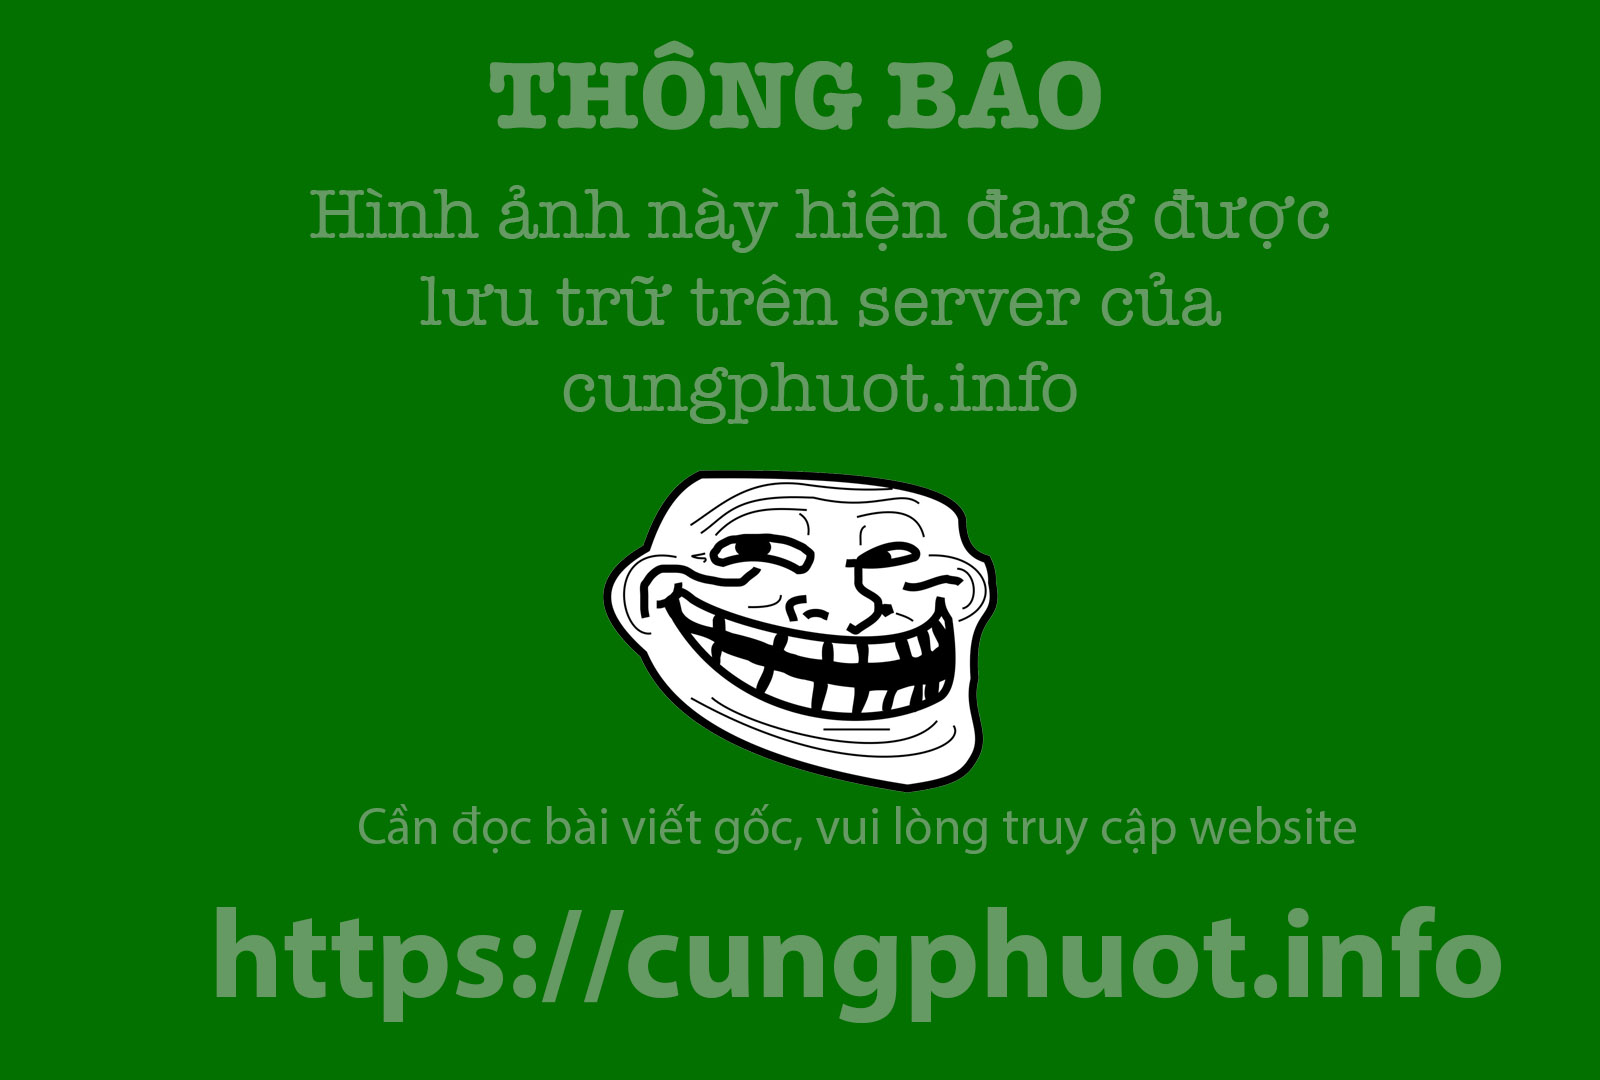 Chon bien cuong 'troi thap, dat cao' o Nam Can hinh anh 13